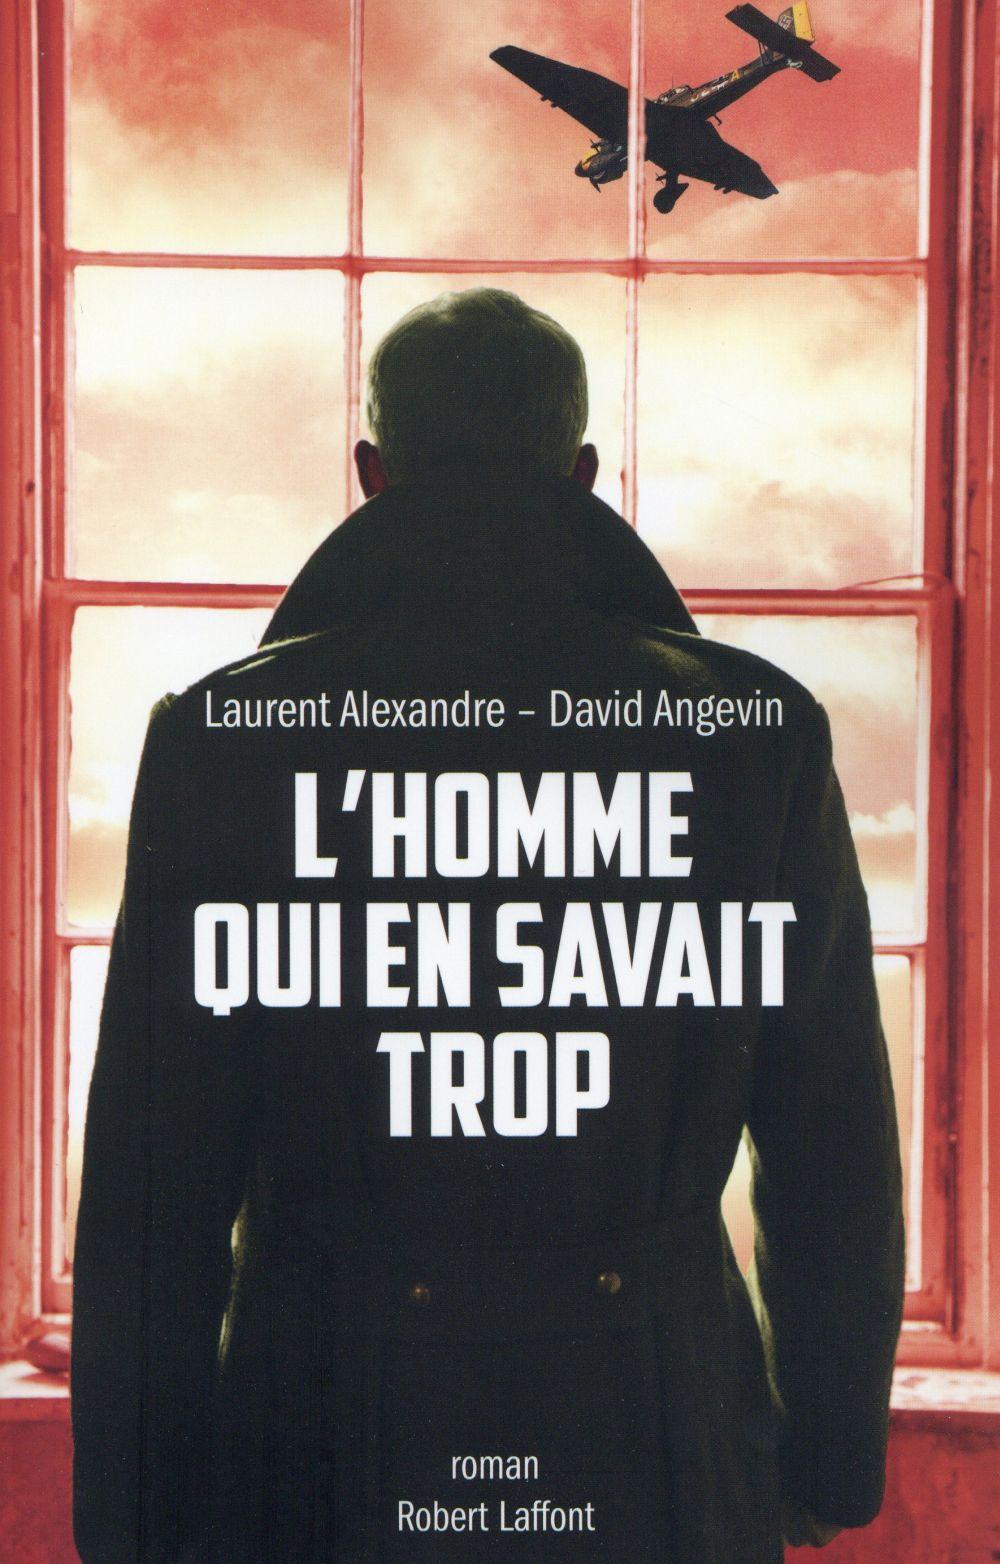 Angevin David - L'HOMME QUI EN SAVAIT TROP